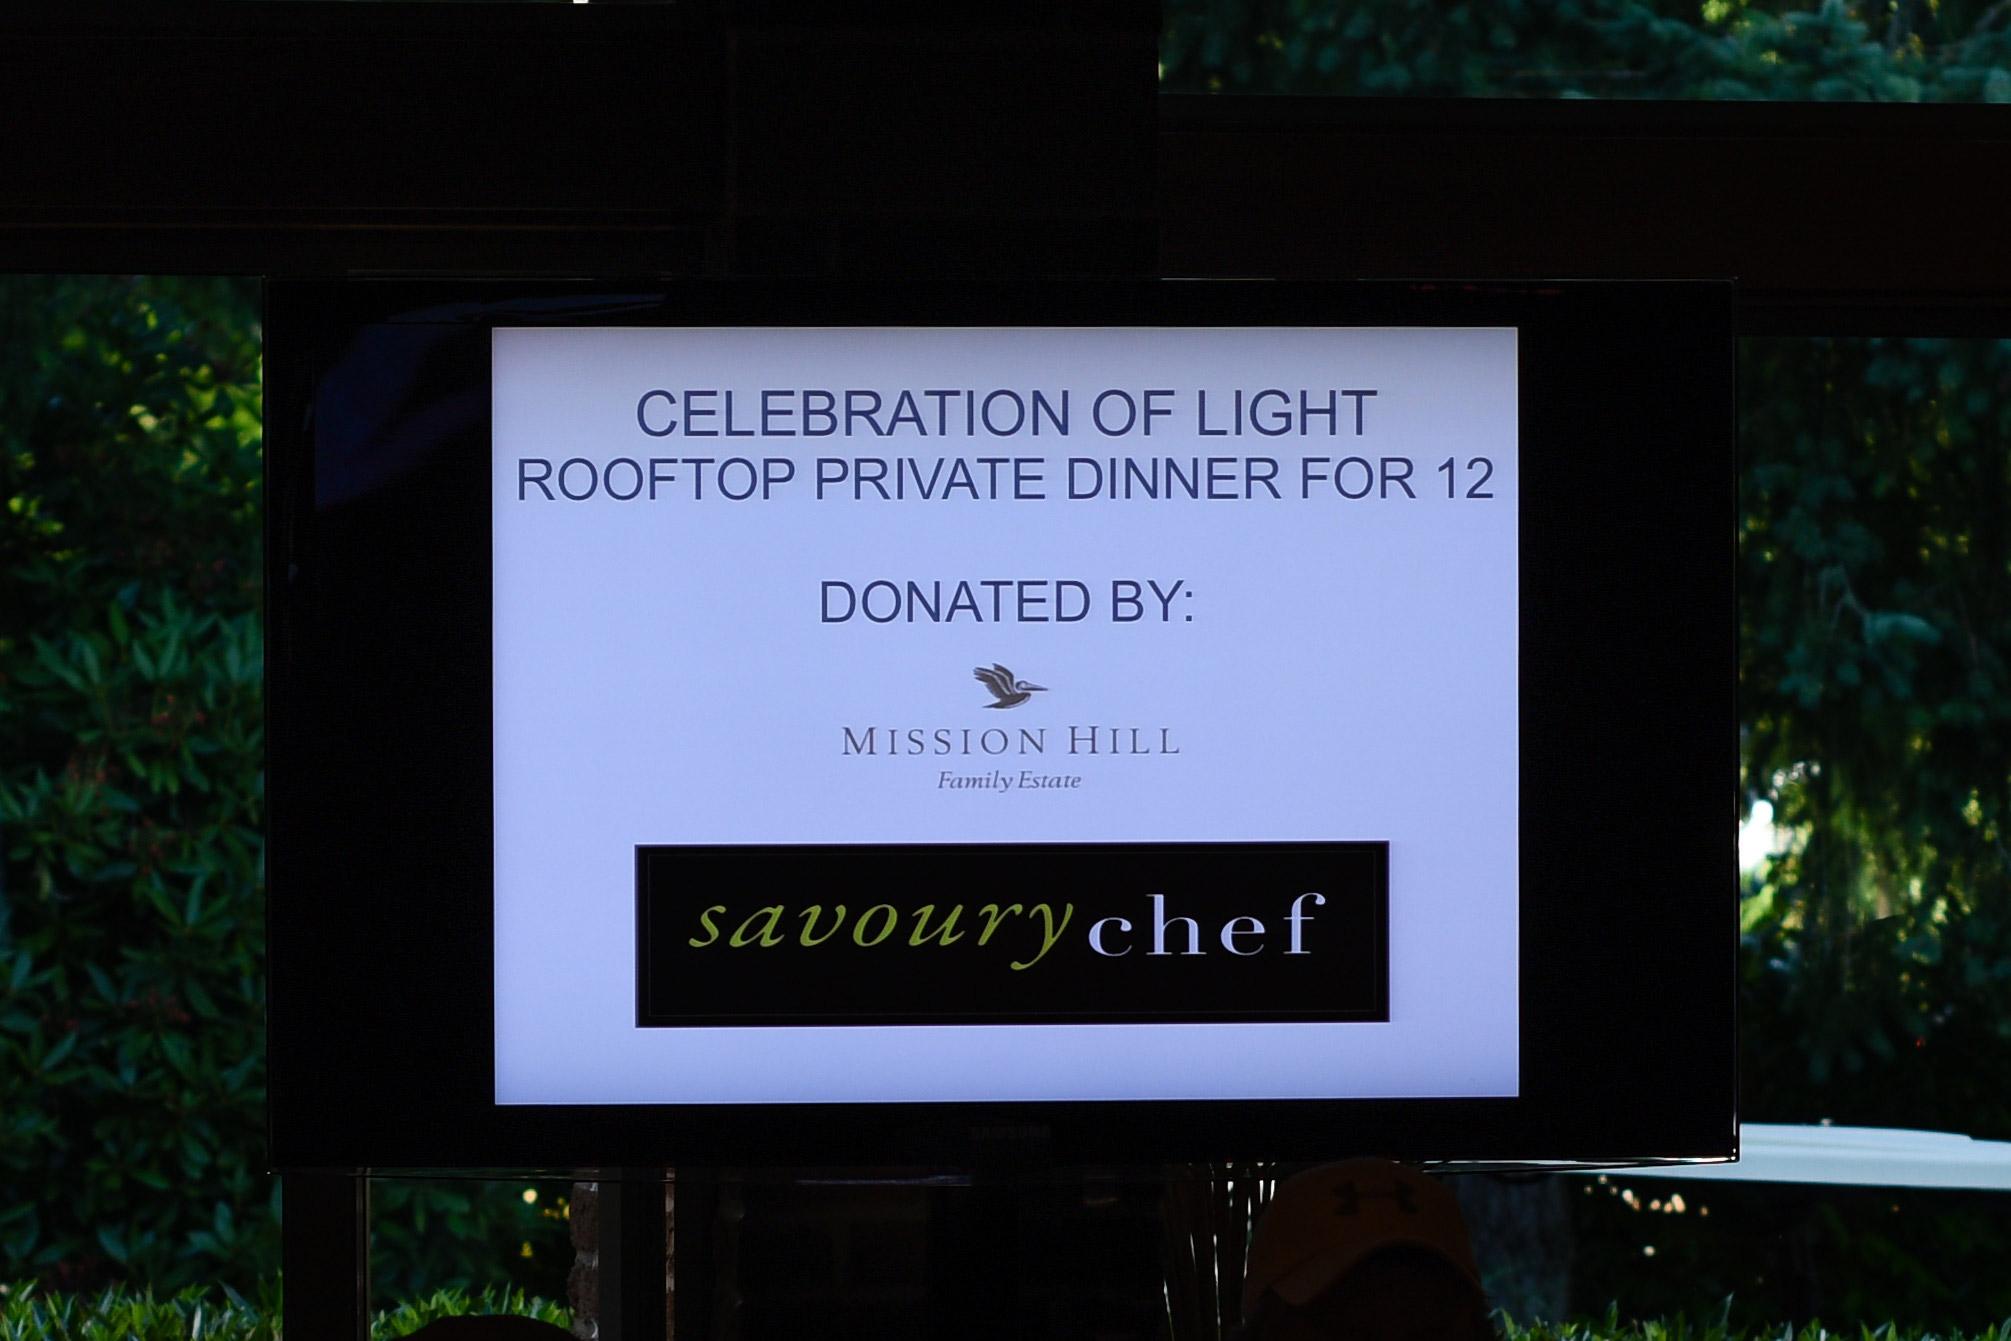 savoury-chef-arts-umbrella-charity-event-3